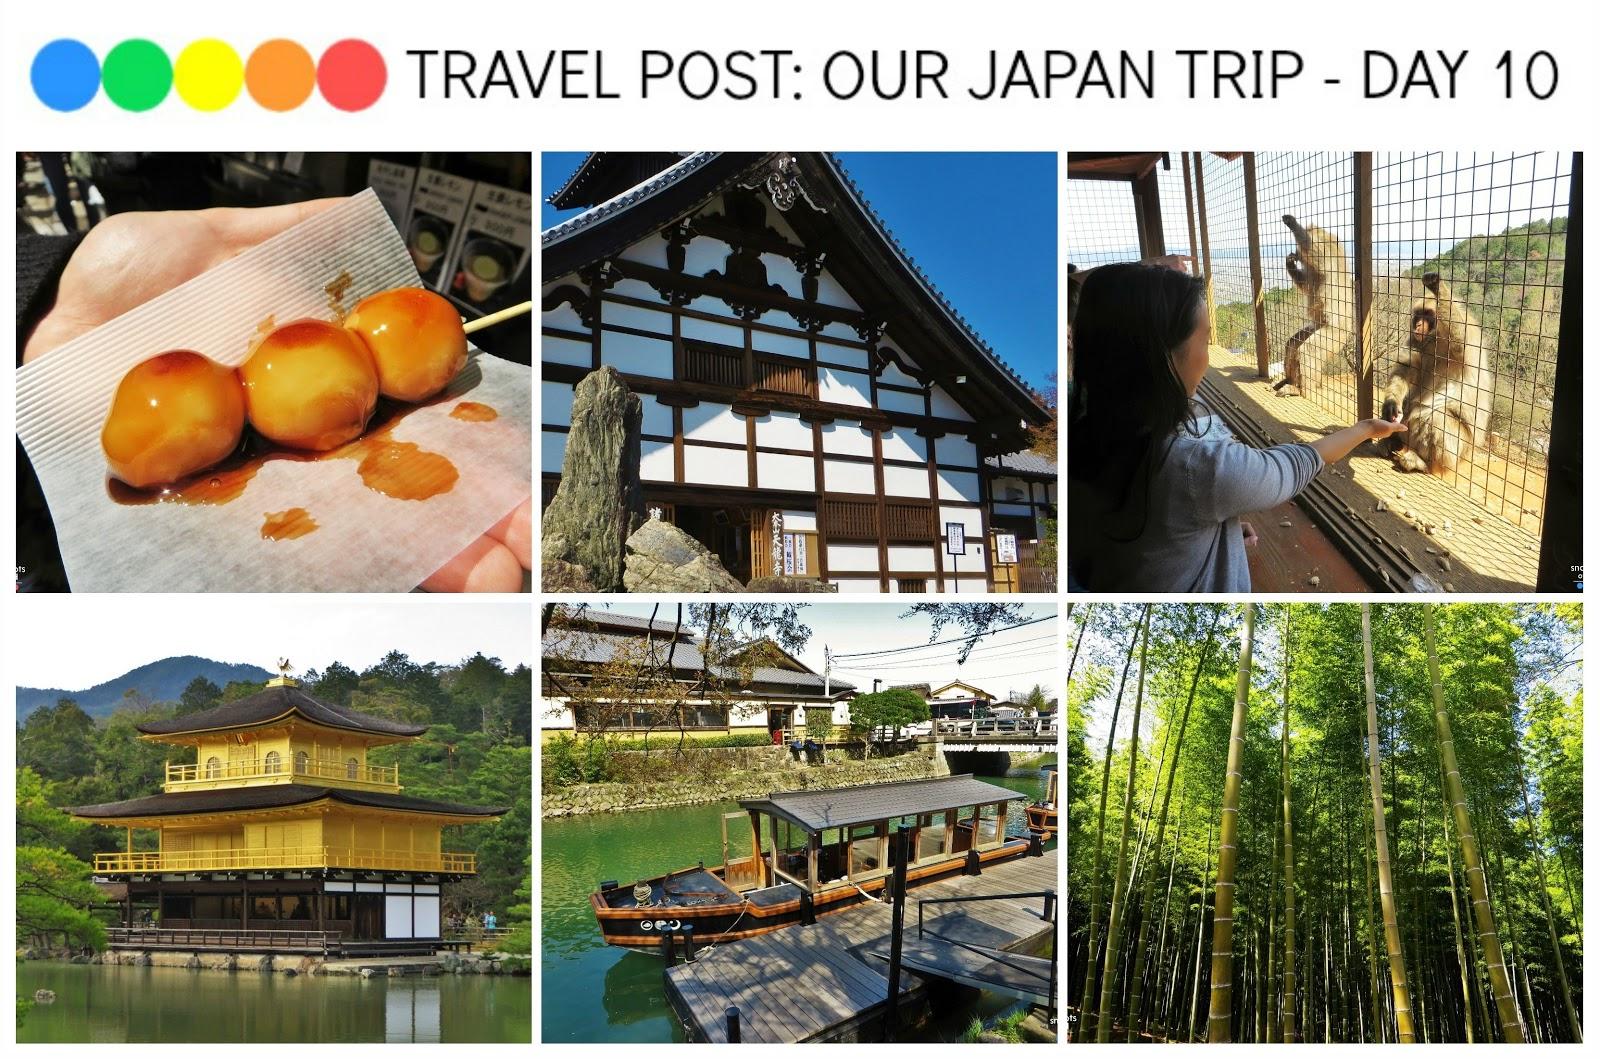 Exploring Kyoto - Tenryu-ji Temple, Arashiyama Bamboo Grove and Monkey Park, Kinkaku-ji